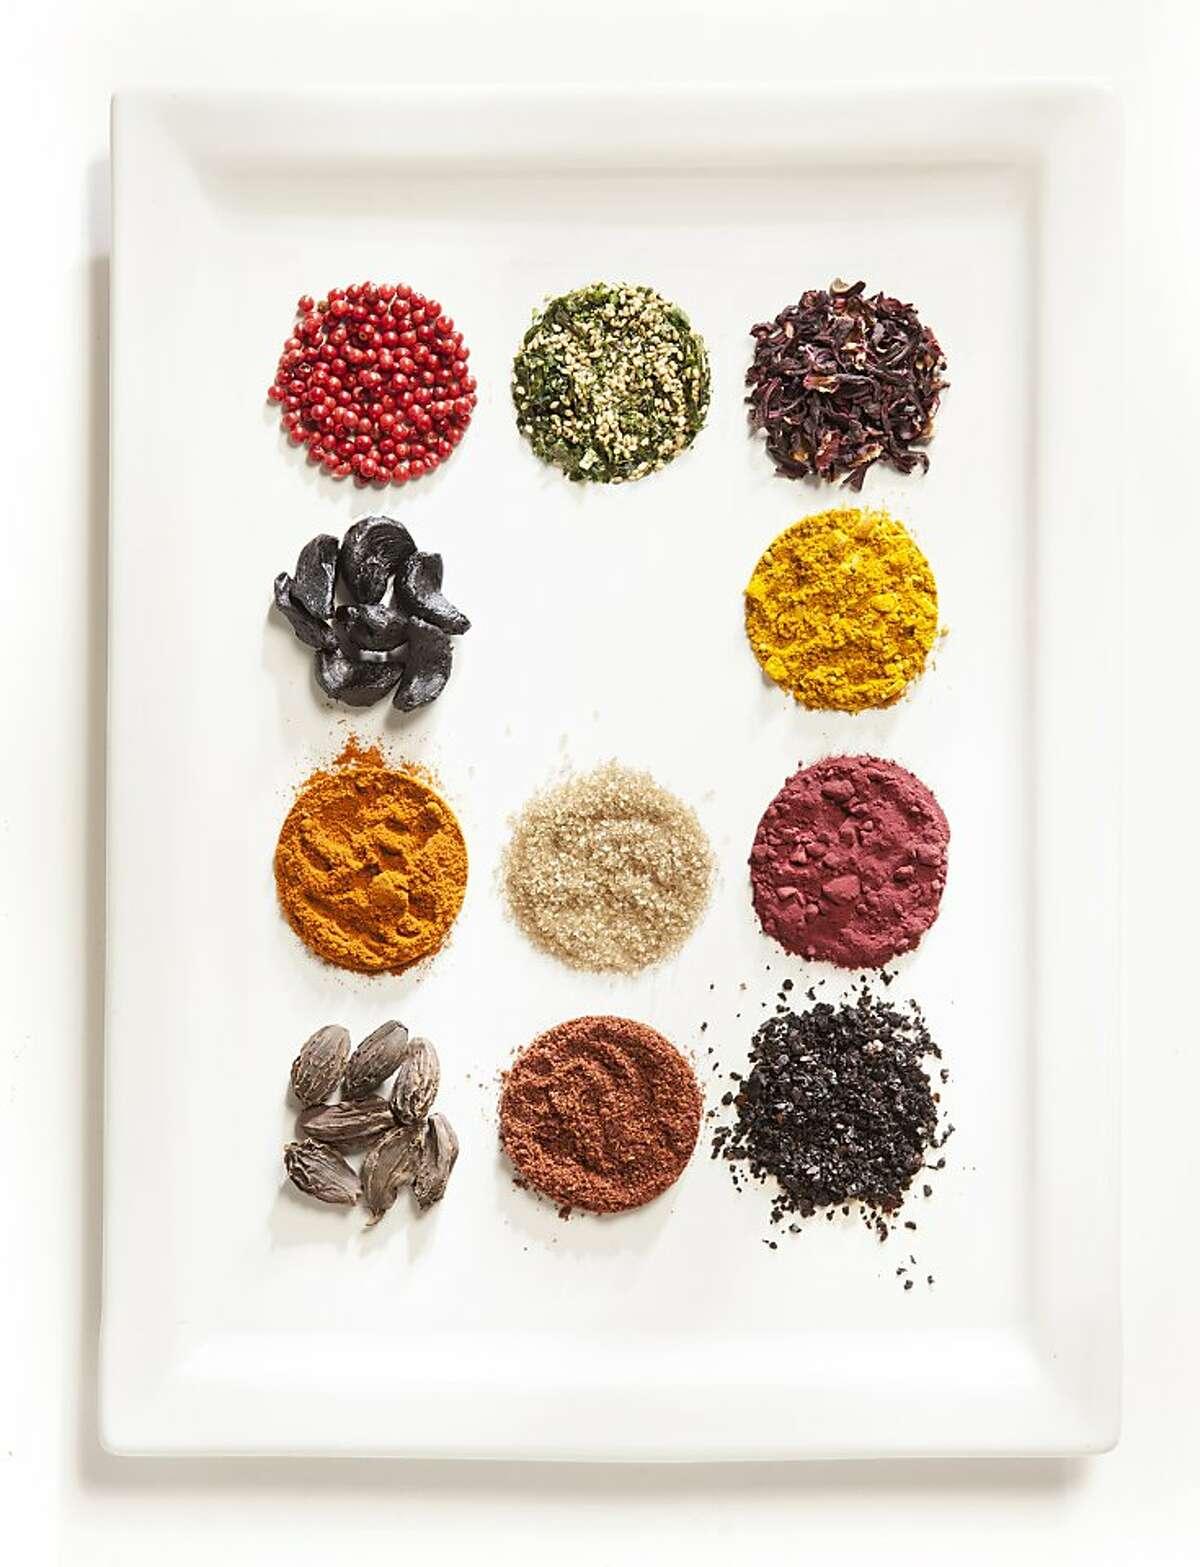 Spices, top row, from left: pink peppercorns, furikake, hibiscus flower. Second row: black garlic, vadouvan. Third row: Berbere, smoked salt, beet powder. Bottom row: black cardamom, sumac, Urfa biber. Styling by Tara Duggan and Jillian Welsh / The Chronicle